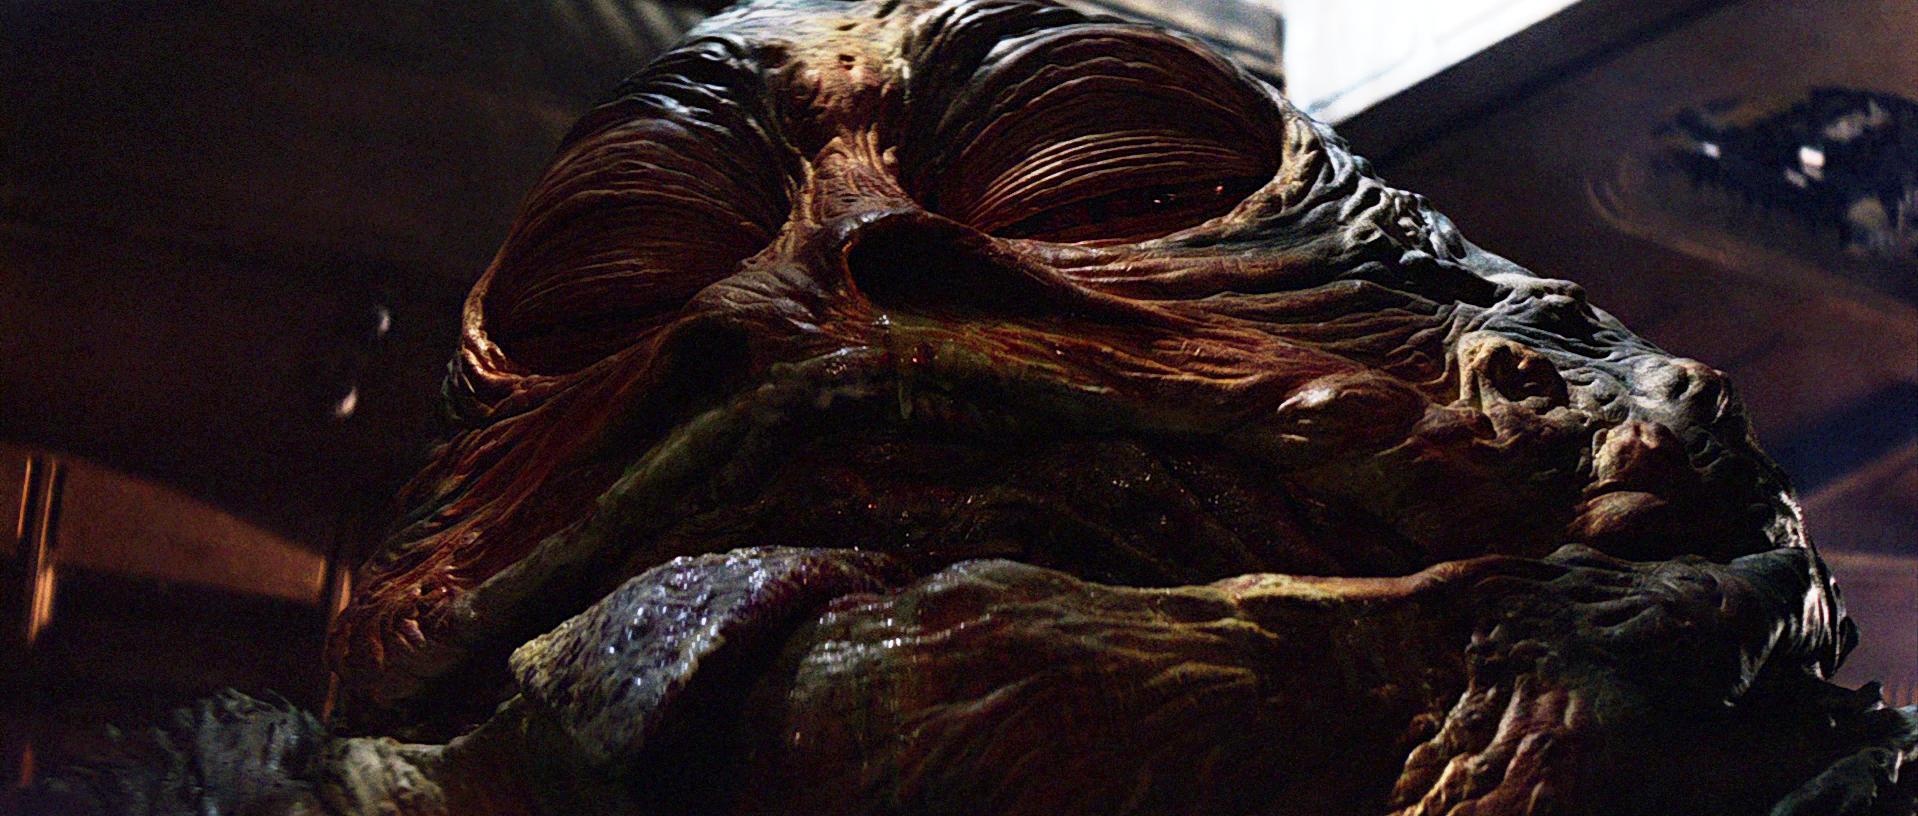 Dead Jabba